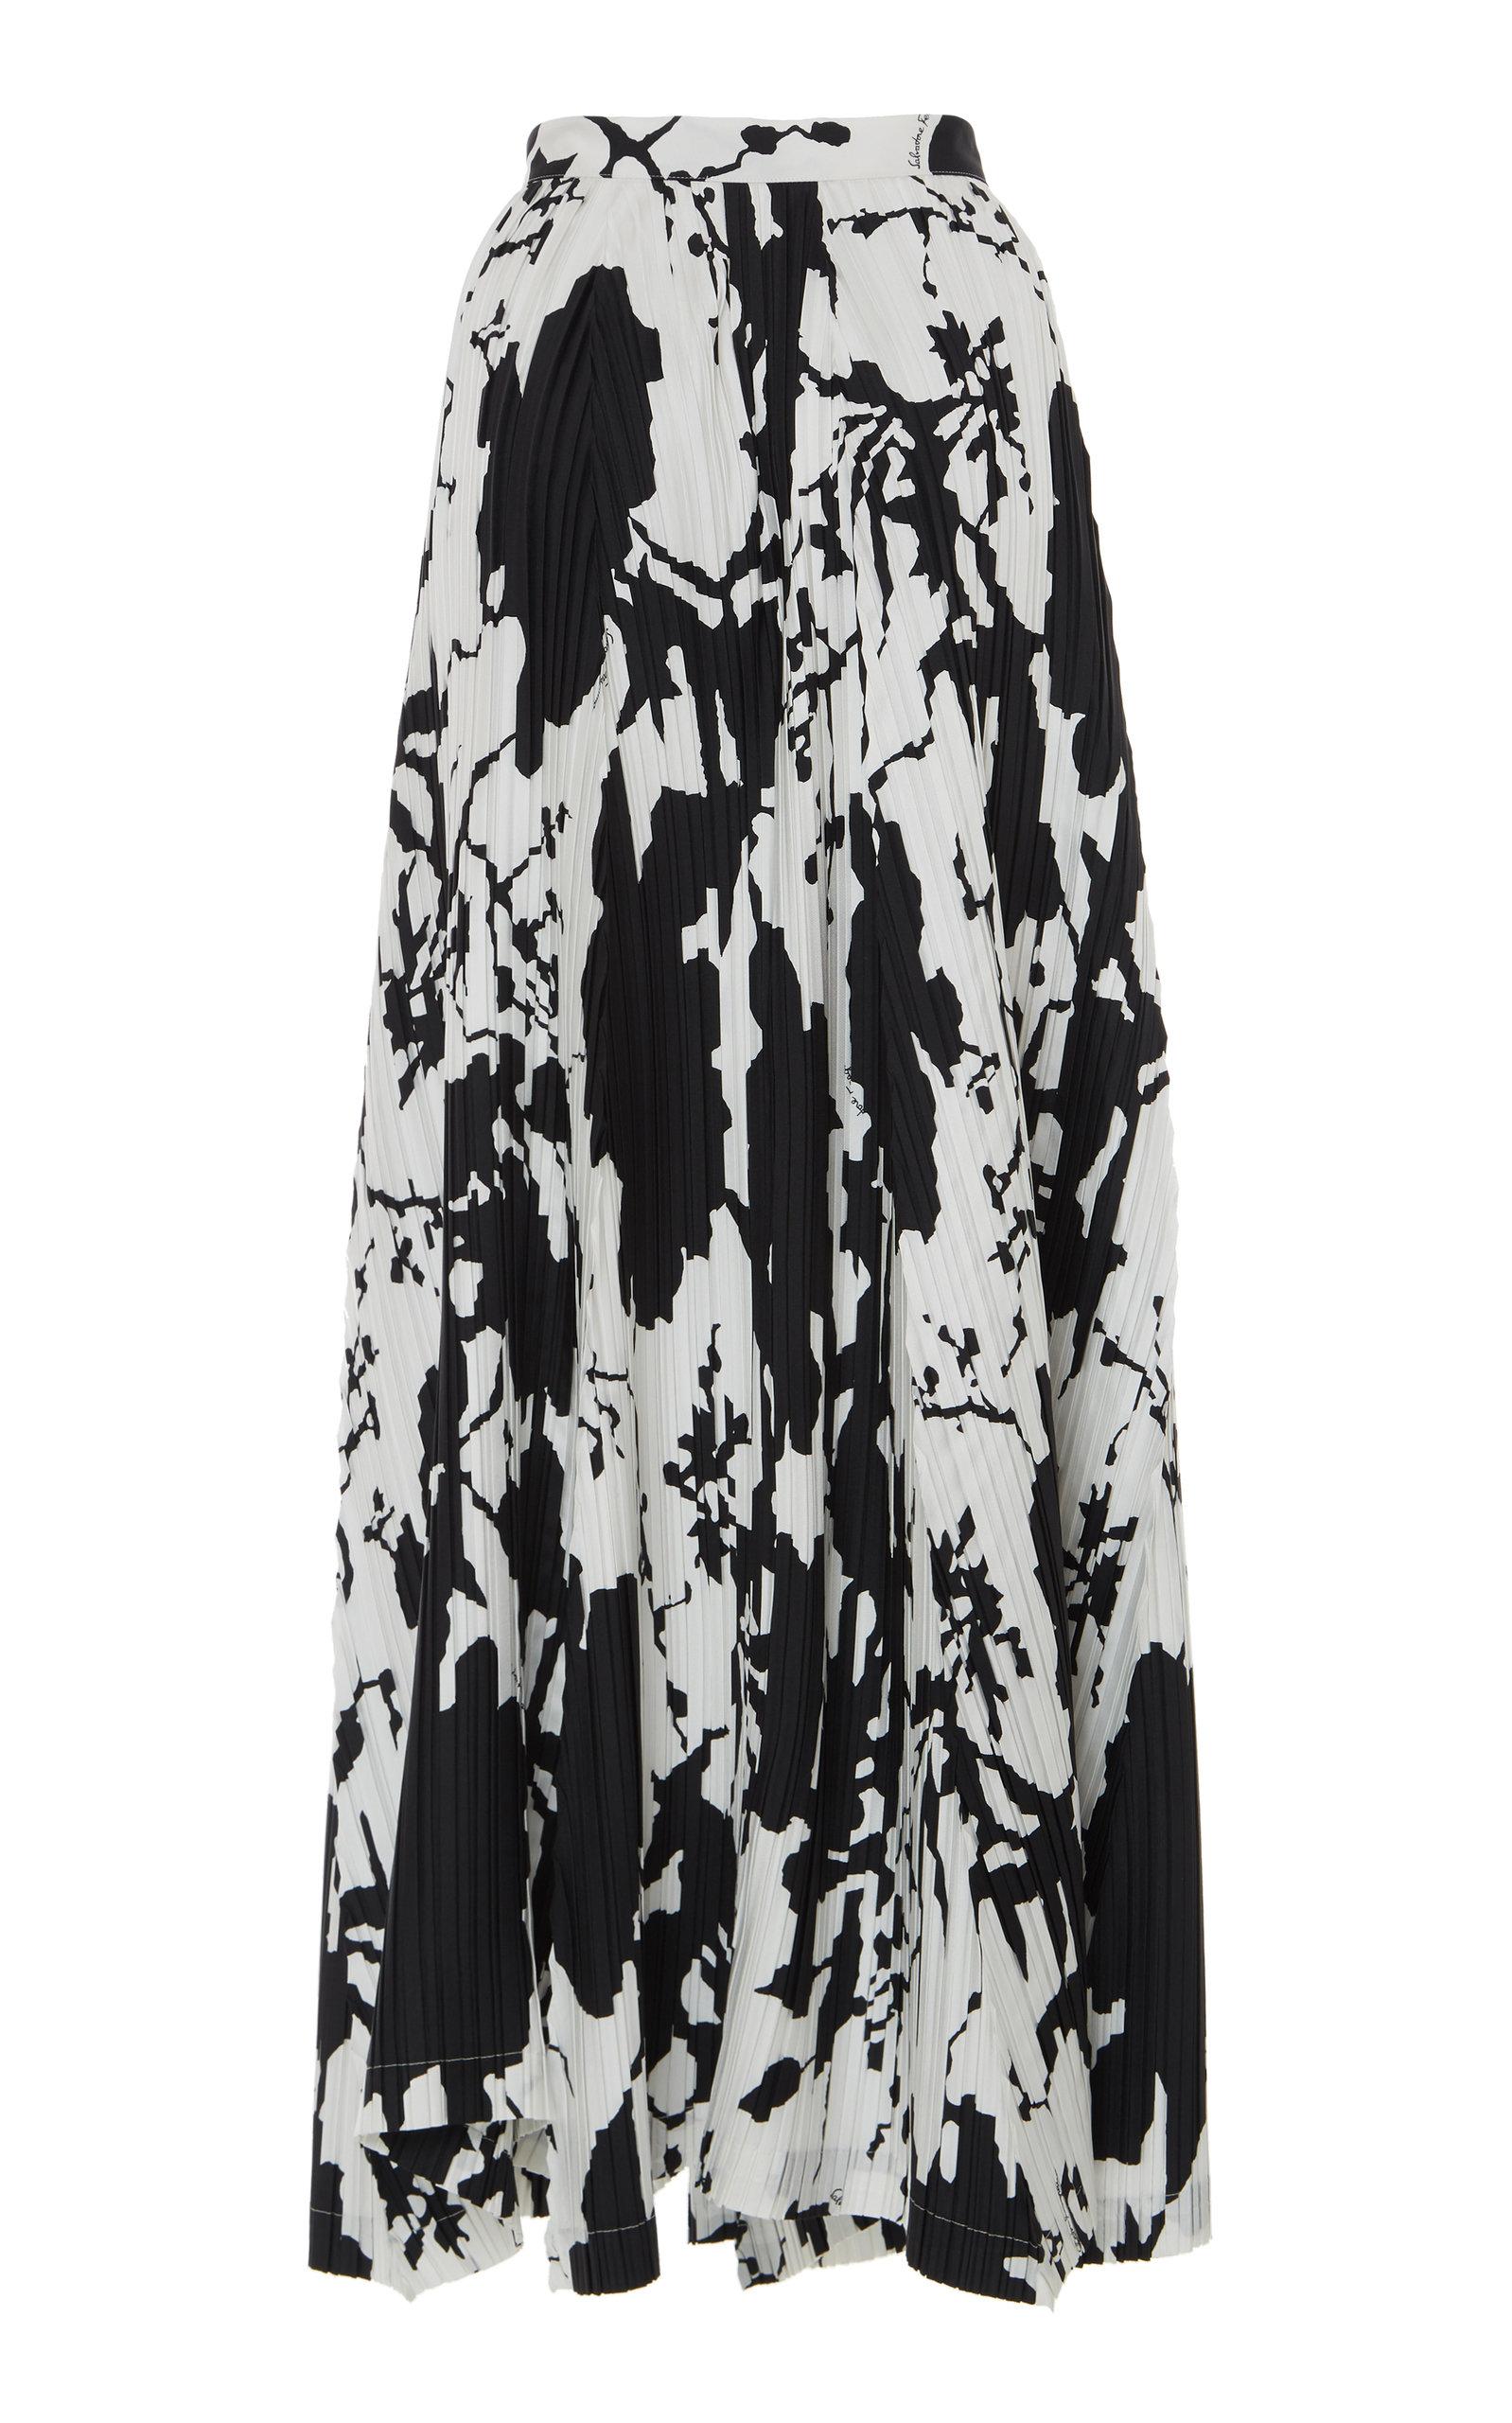 ed328109d Salvatore FerragamoAbstract-Printed Pleated Maxi Skirt. CLOSE. Loading.  Loading